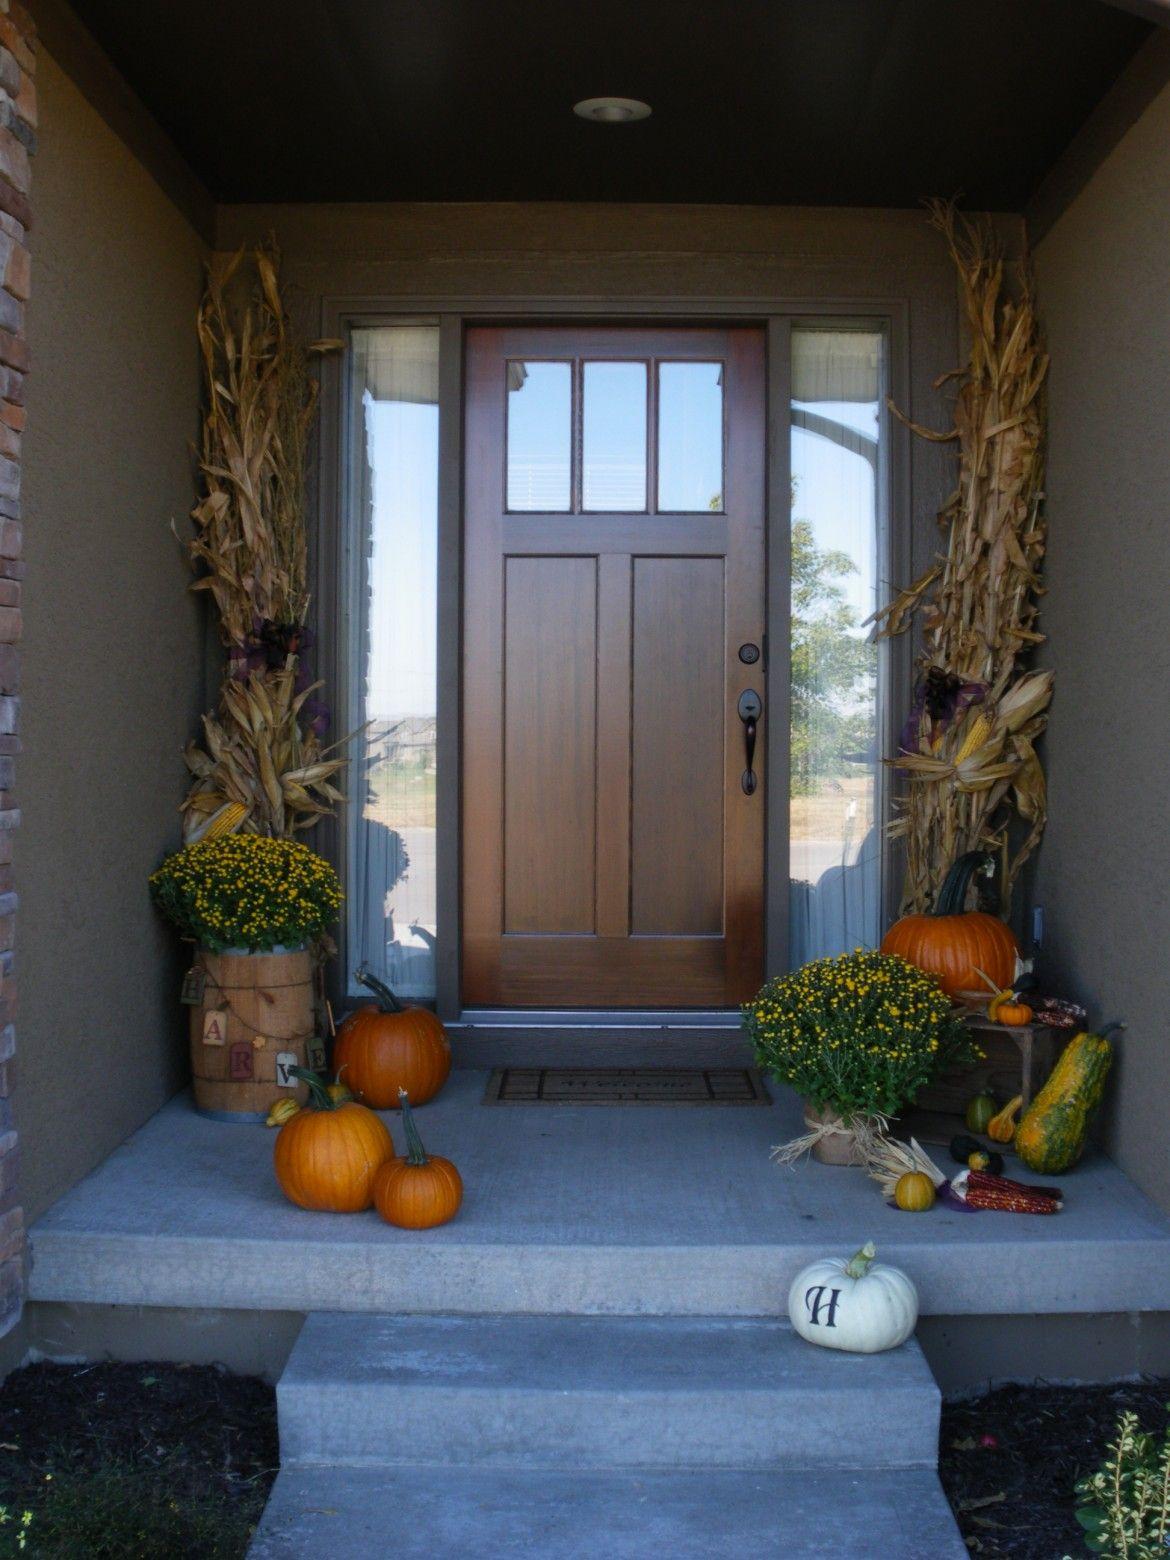 Pin by krissy l on home decor pinterest doors front door